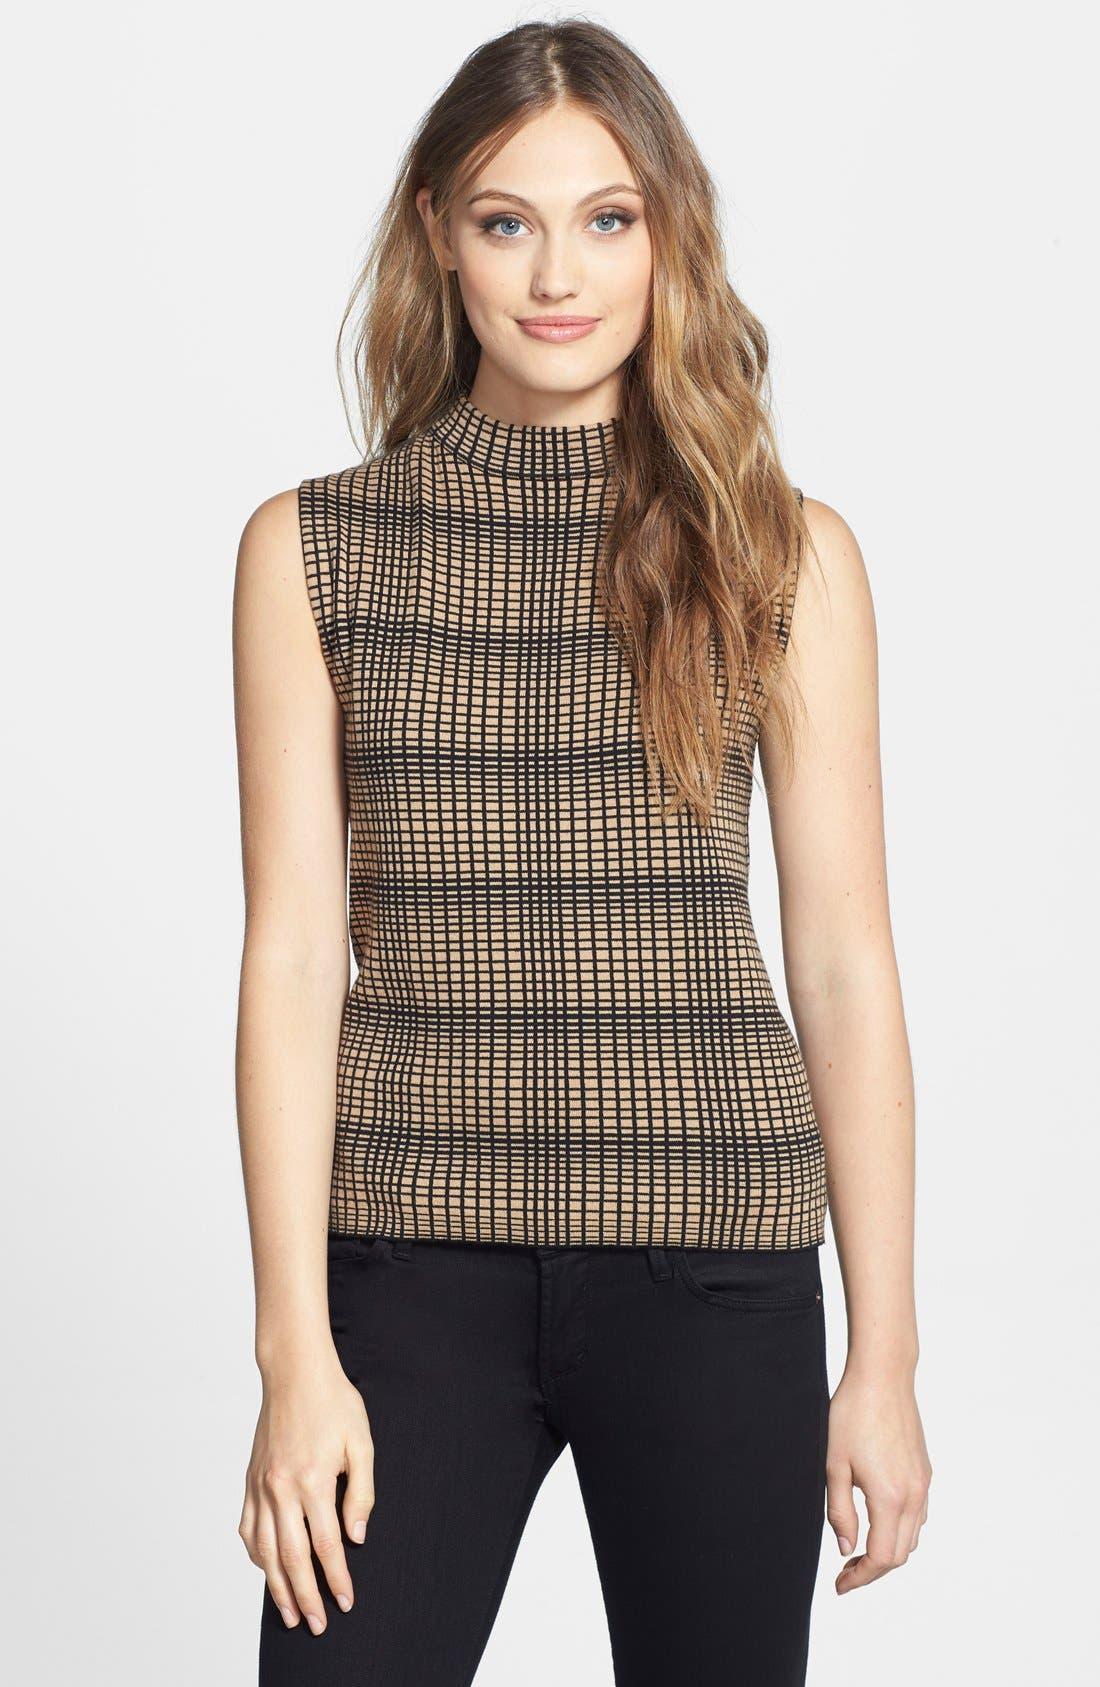 Alternate Image 1 Selected - Vince Camuto Plaid Jacquard Sleeveless Sweater